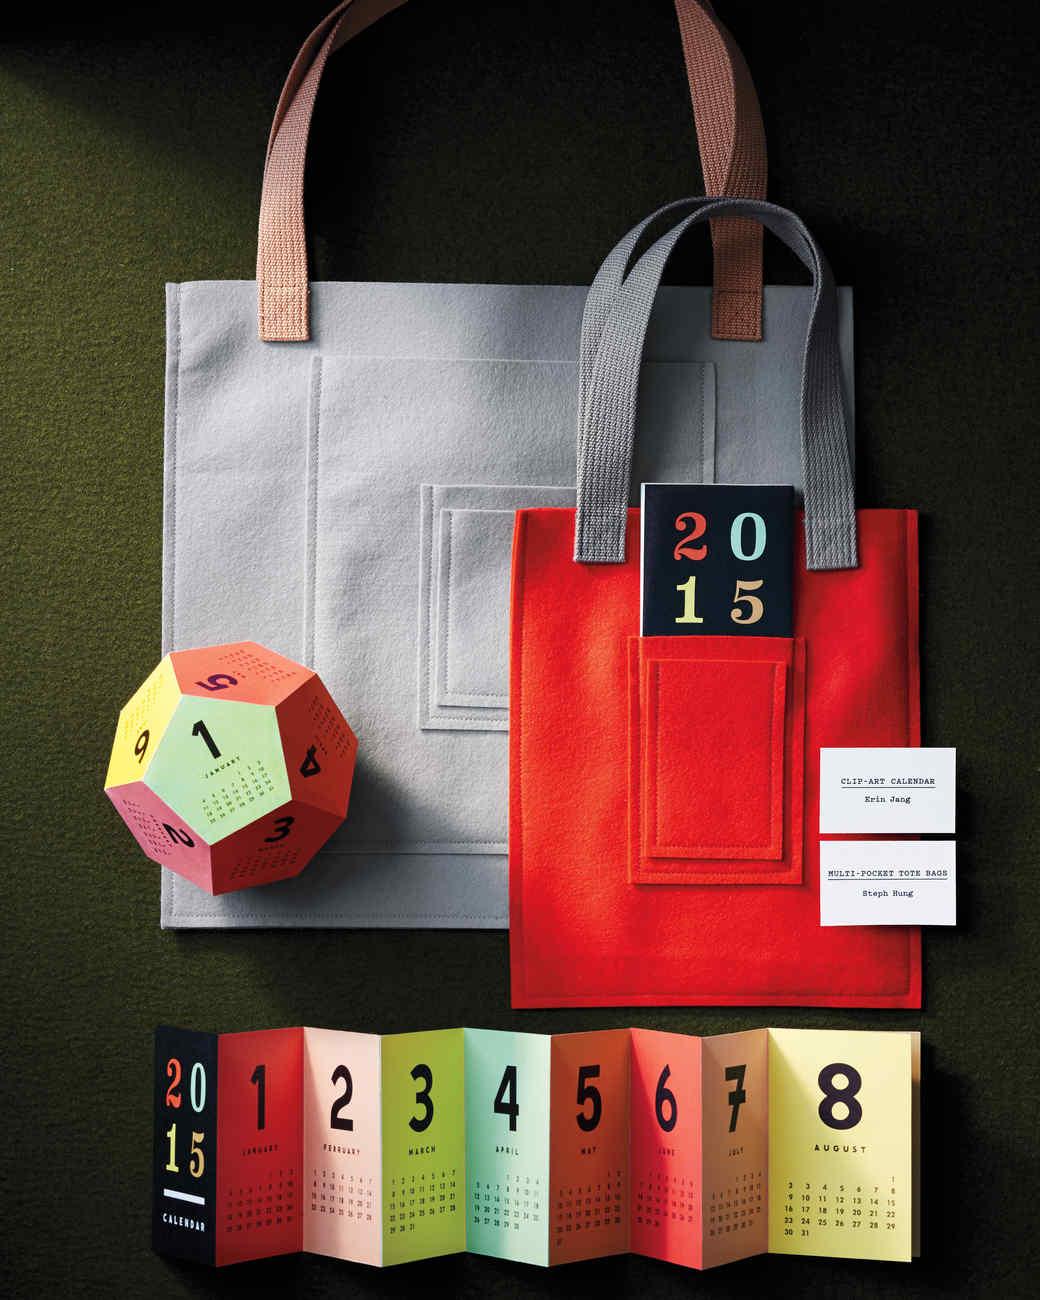 bags-and-calendars-014-d111537.jpg